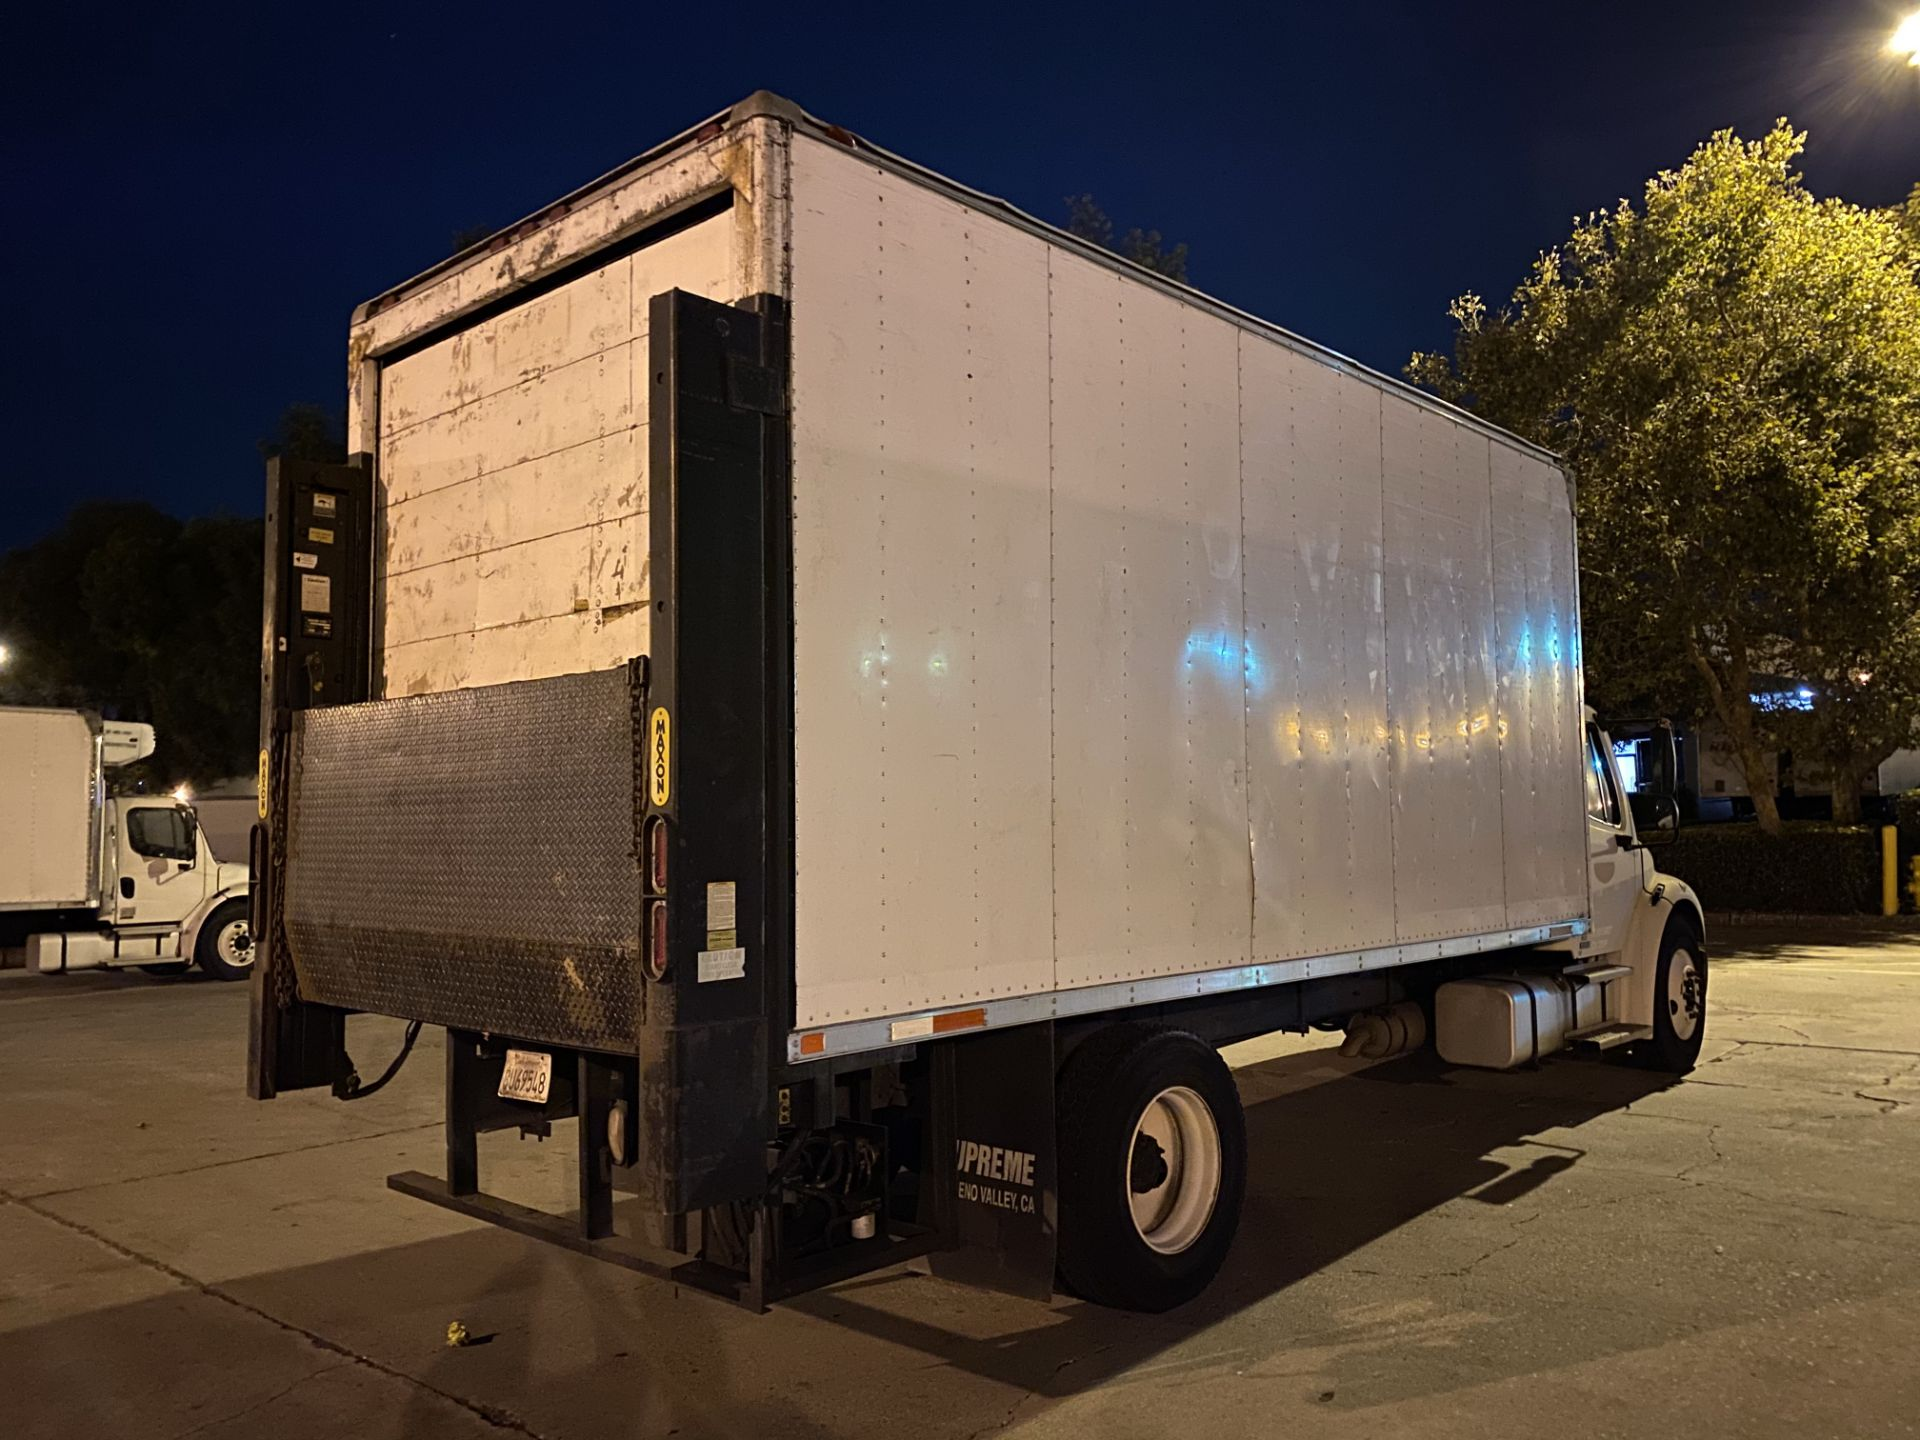 2005 Freightliner dry van truck - Image 3 of 5